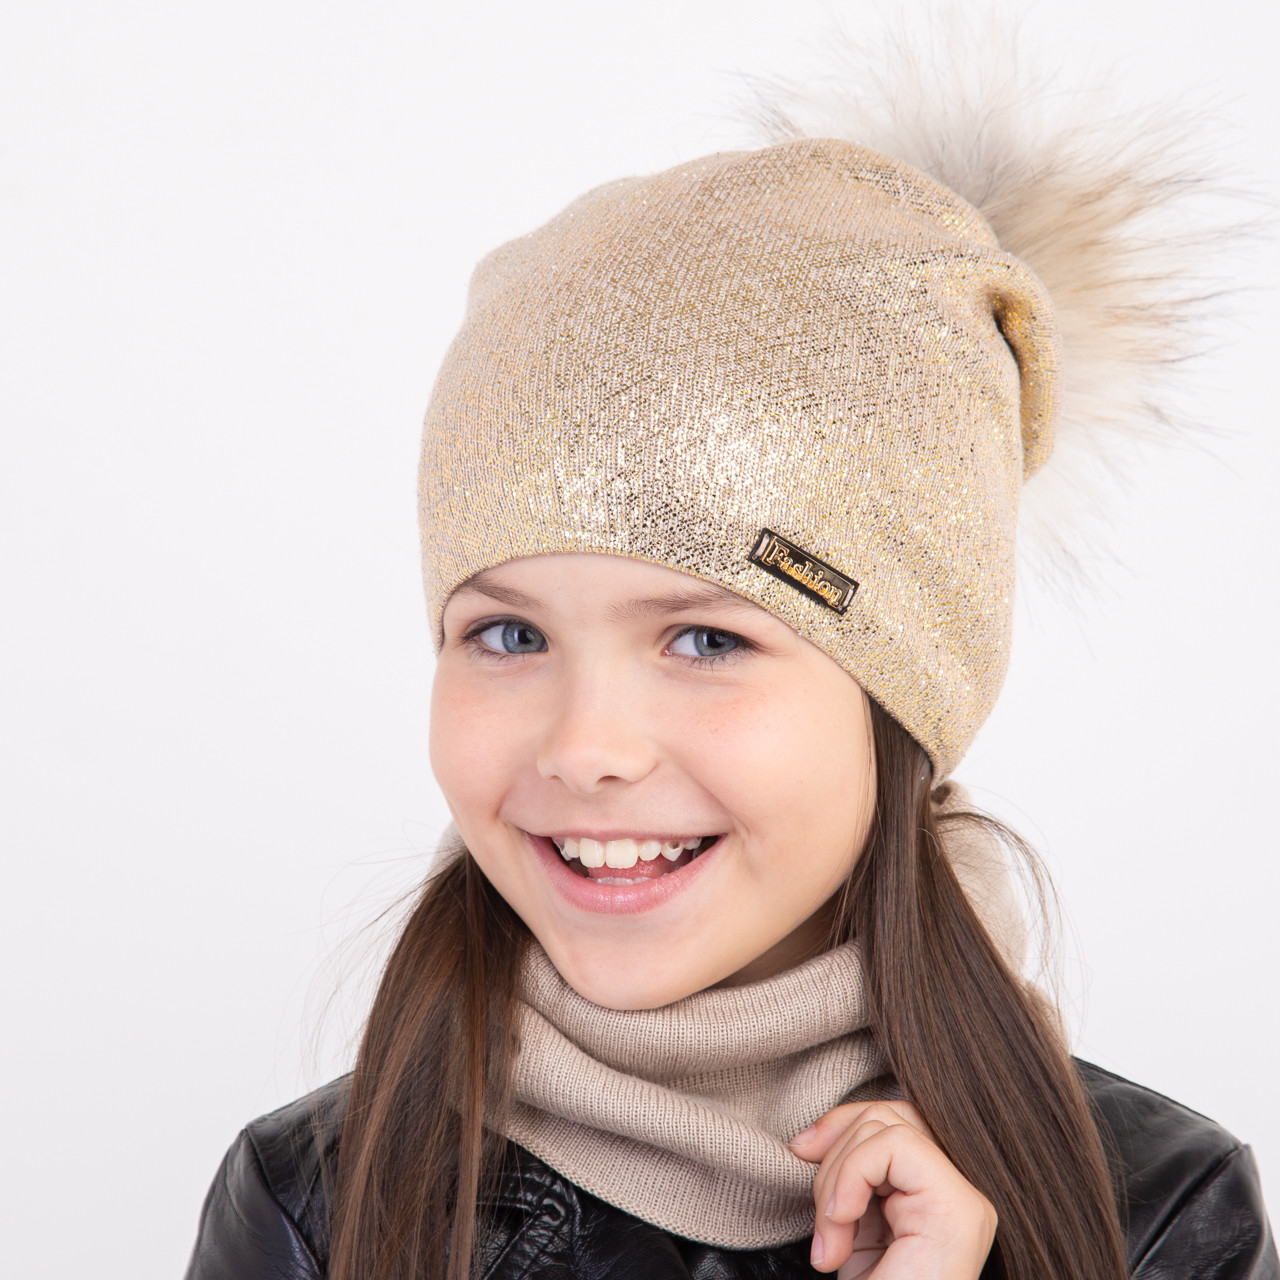 Модный комплект для девочки на зиму оптом - Артикул 2359